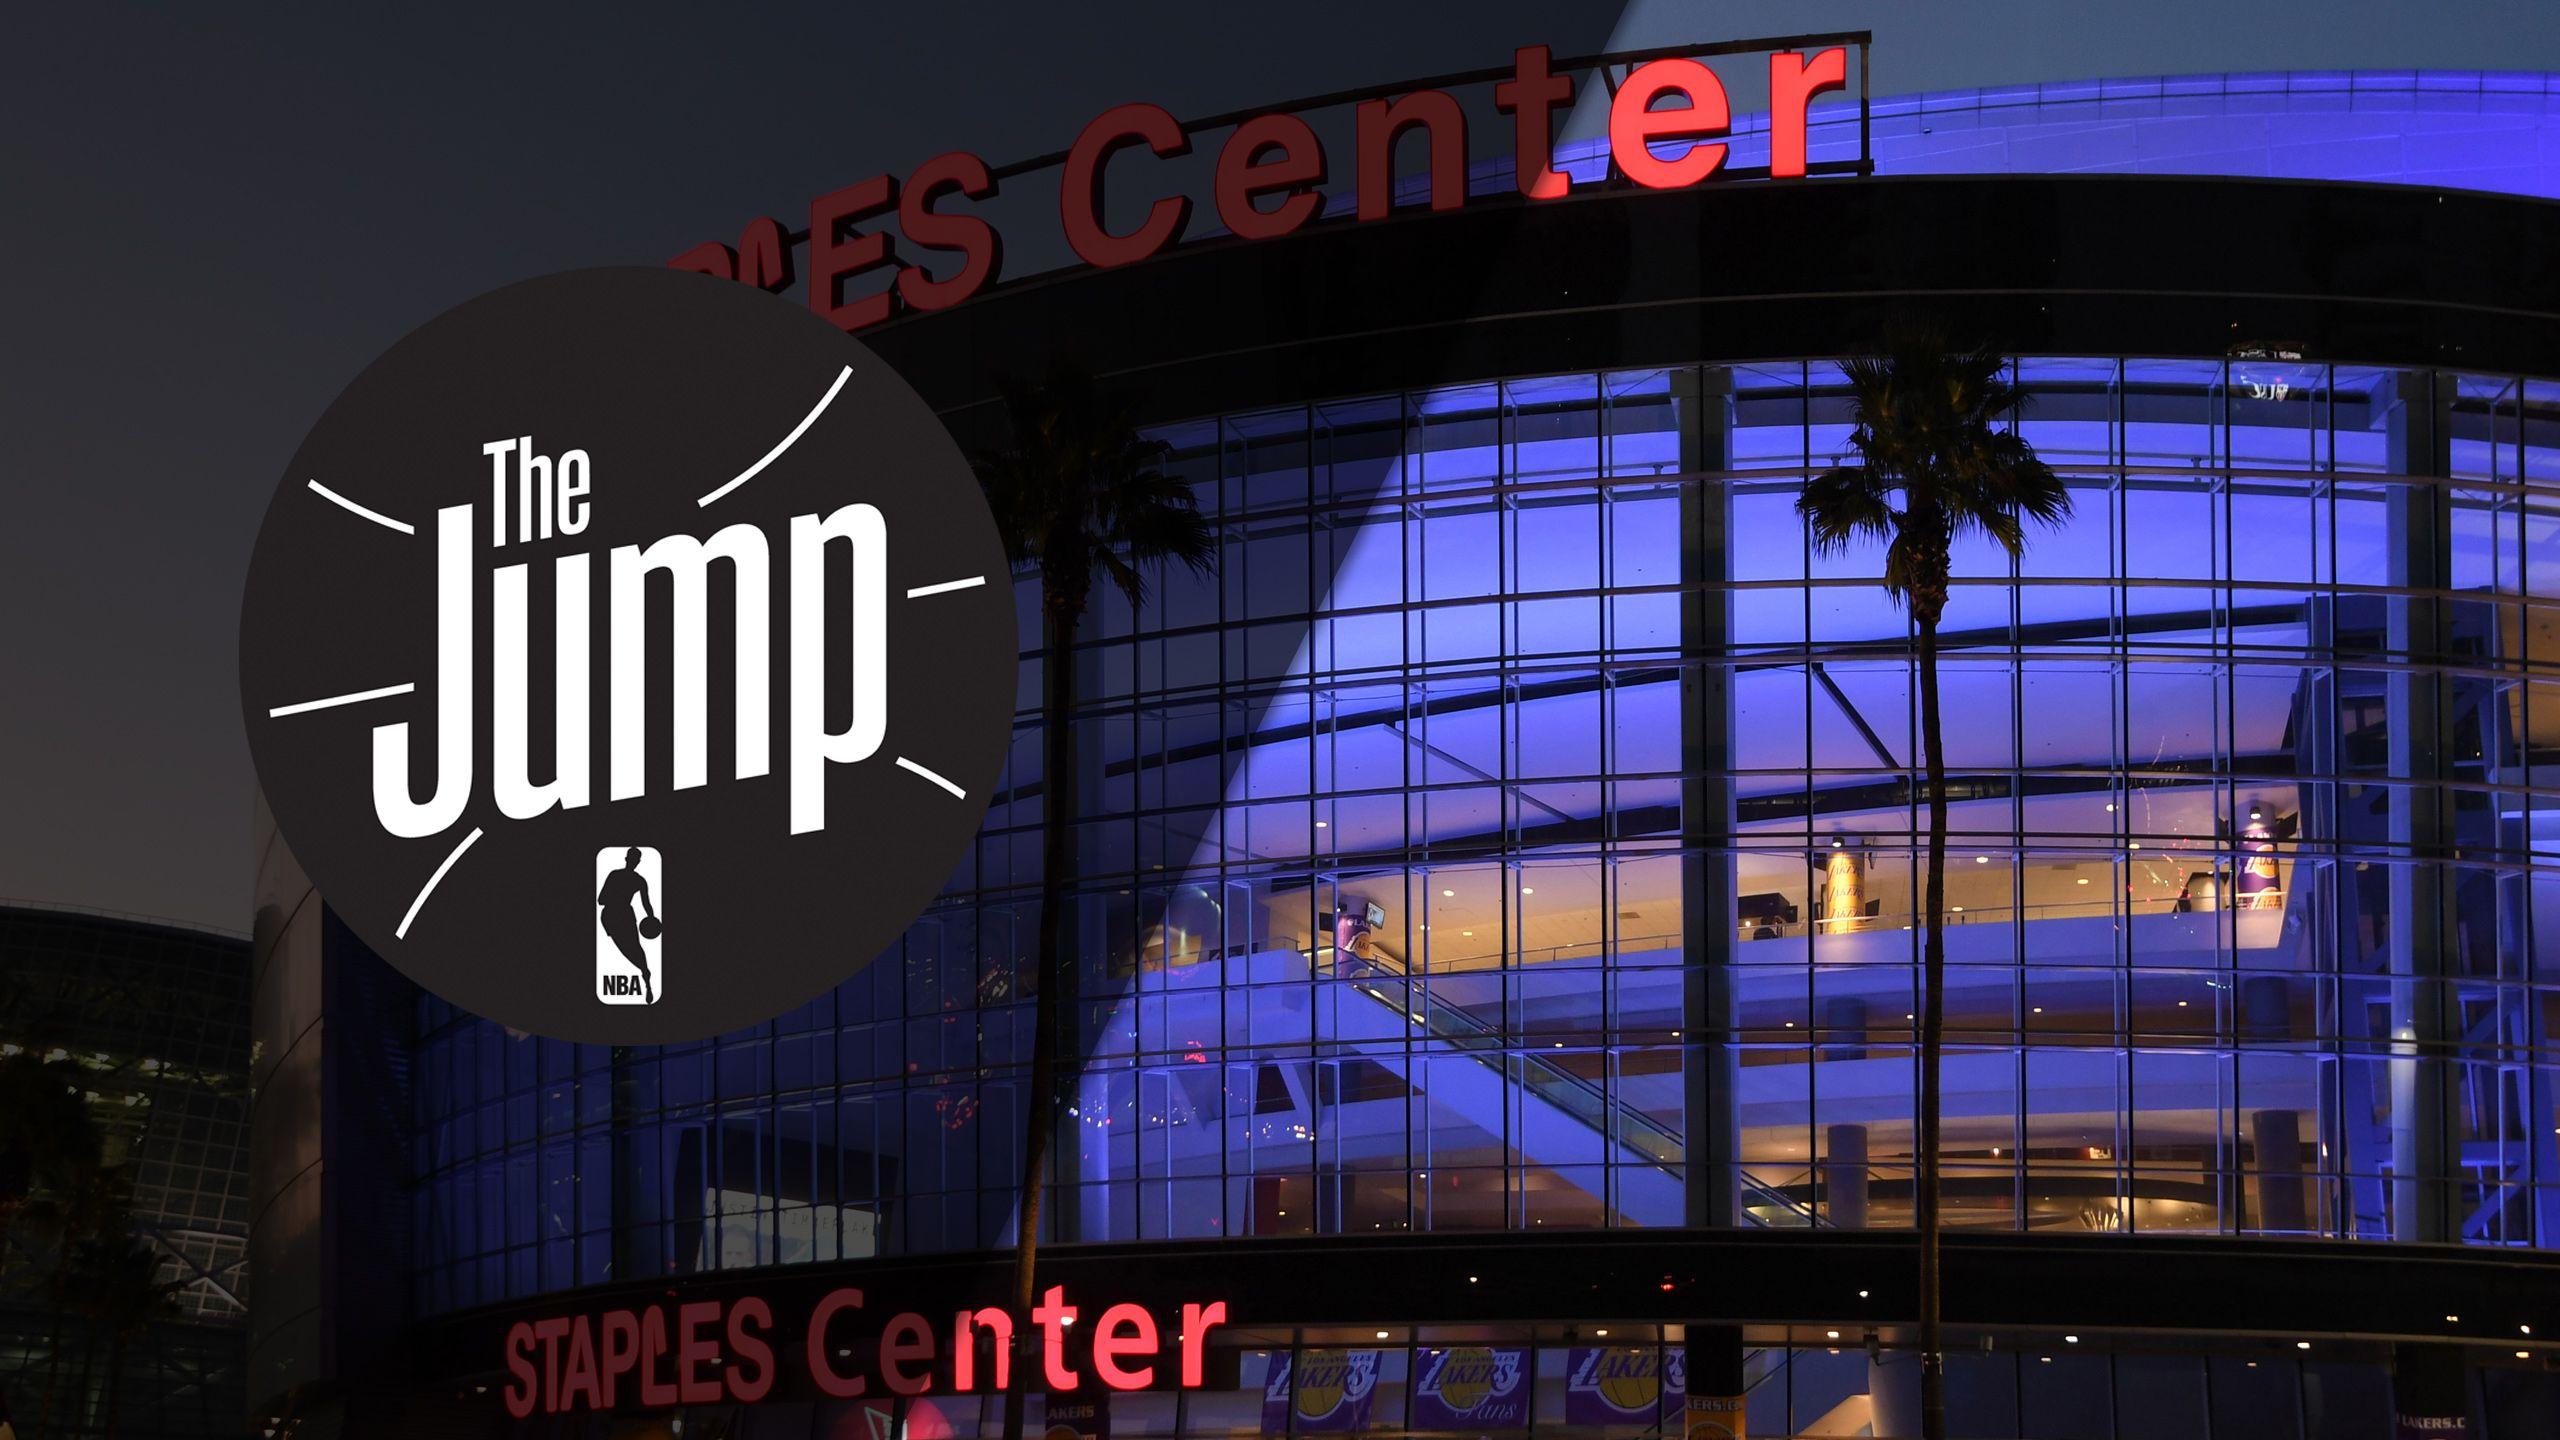 Thu, 2/15 - NBA: The Jump